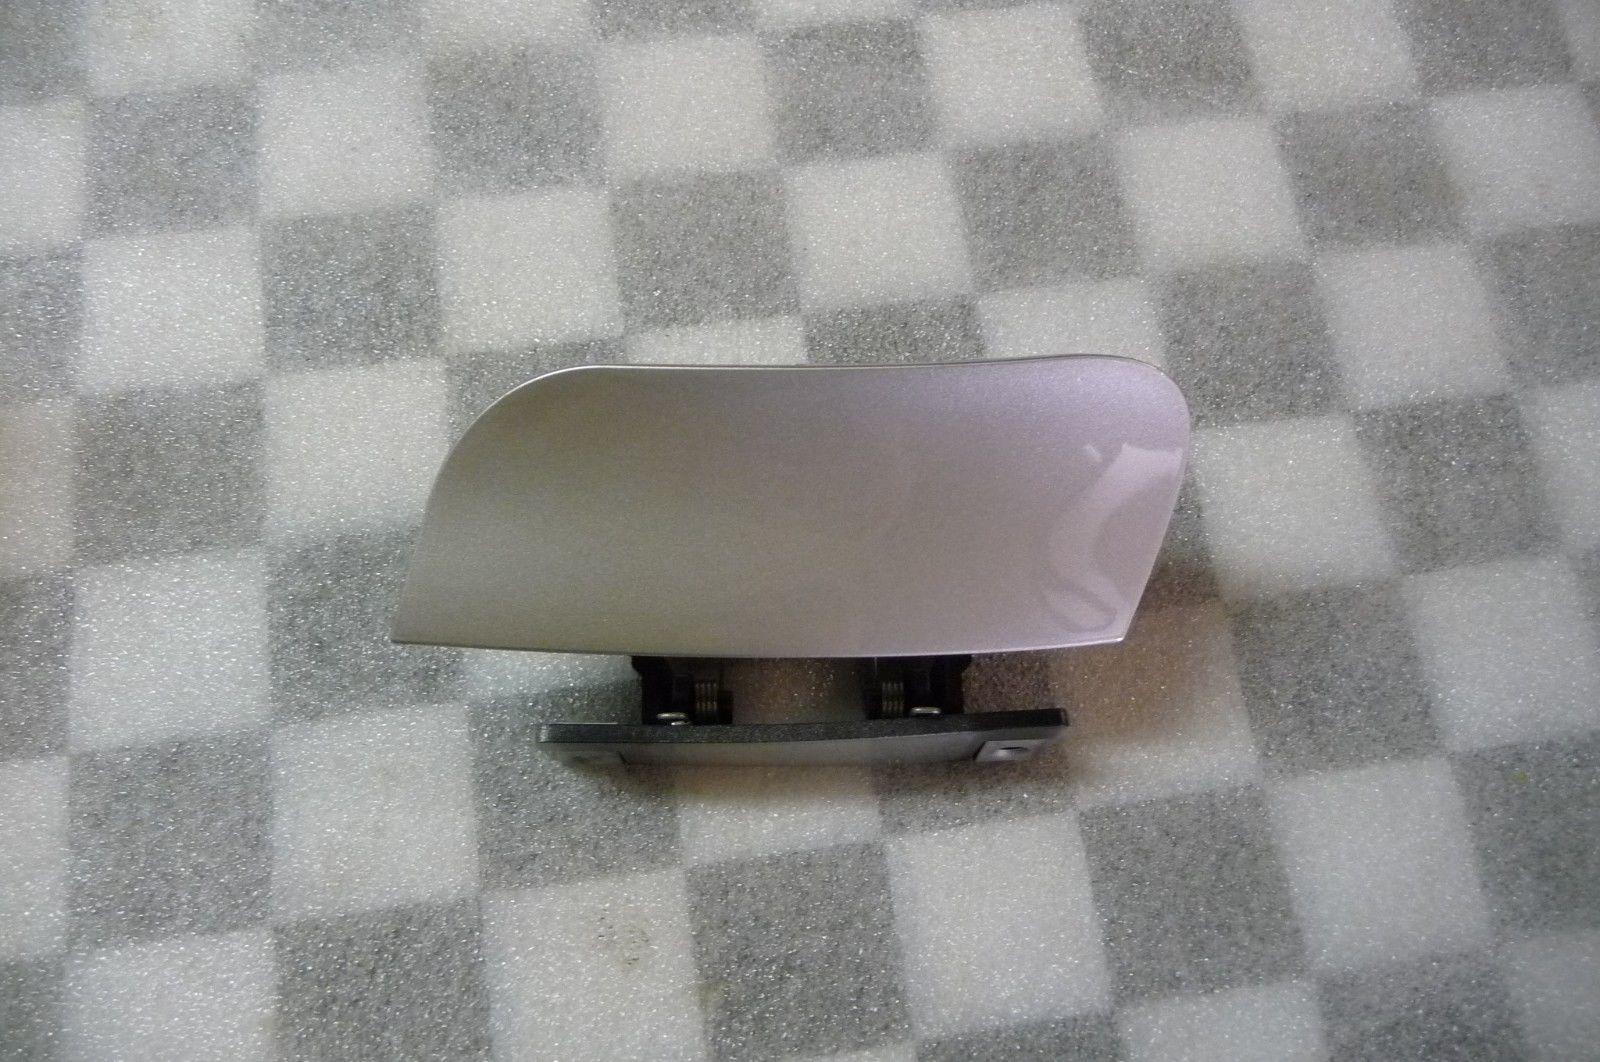 Mercedes Benz S Class Left Headlight Washer Wiper Cover A 2208800305 9744